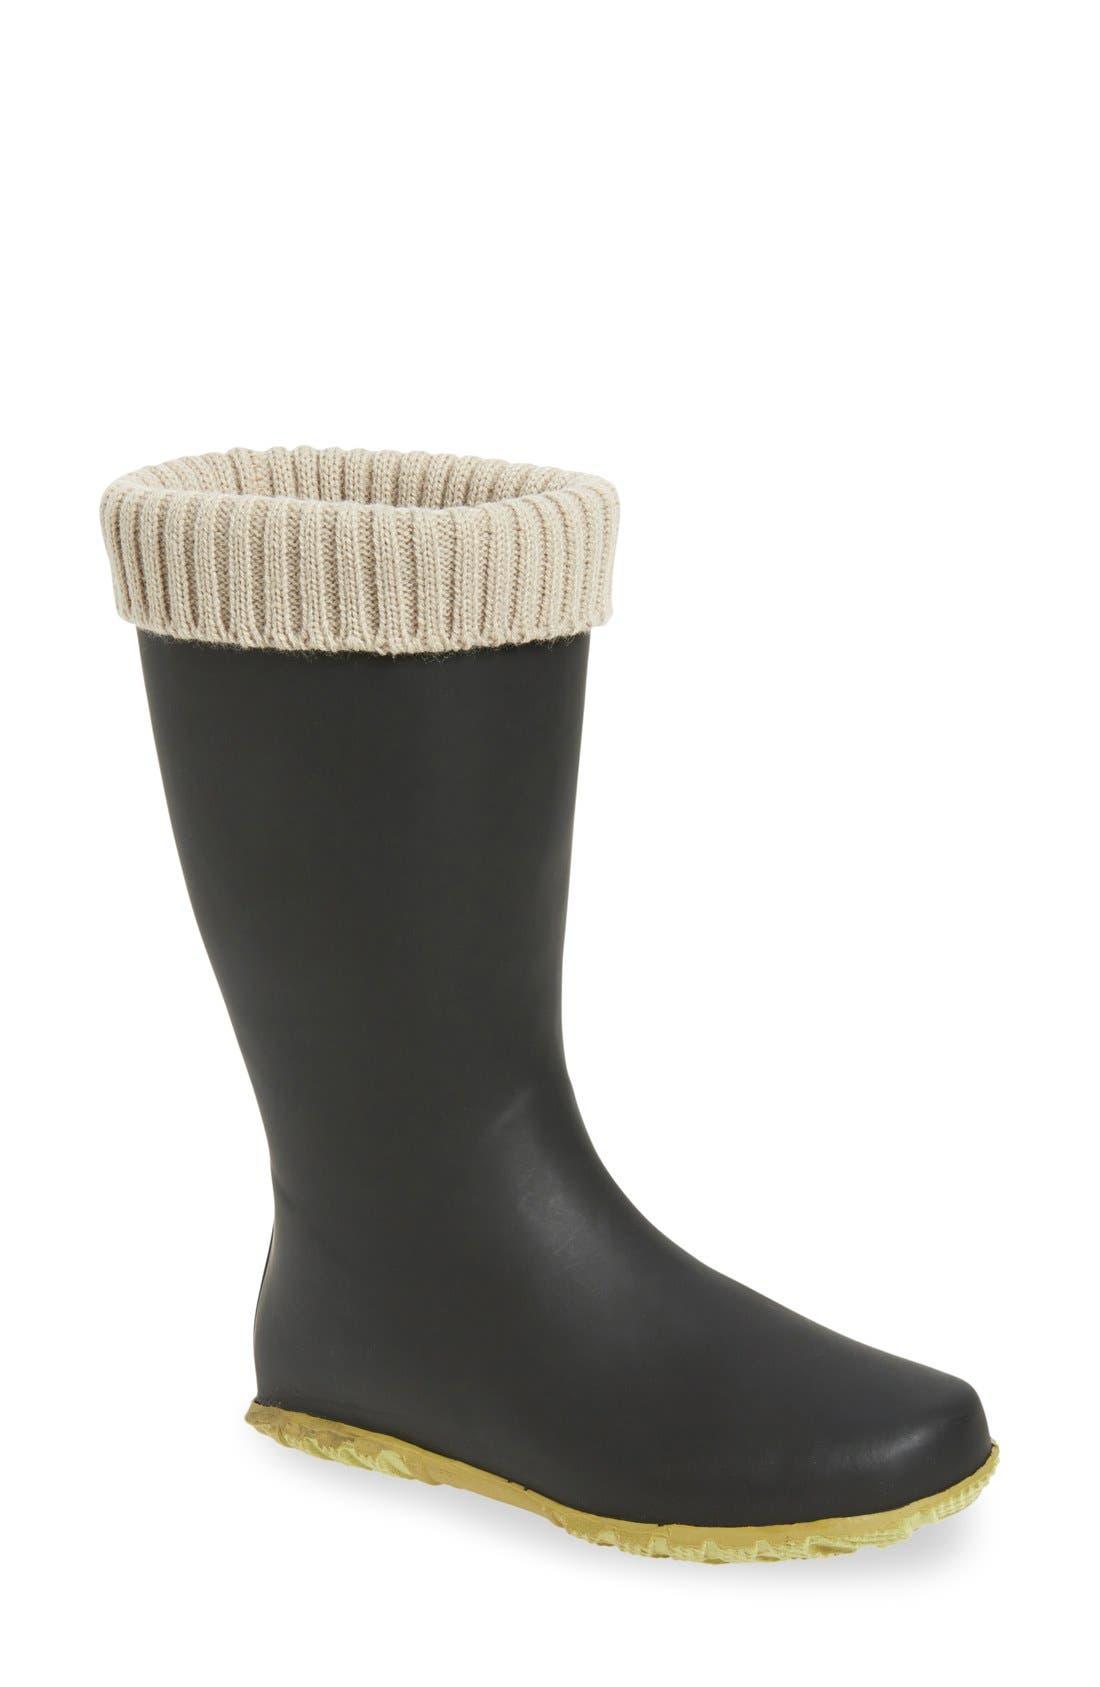 Weatherproof Rain Boot,                         Main,                         color, Black